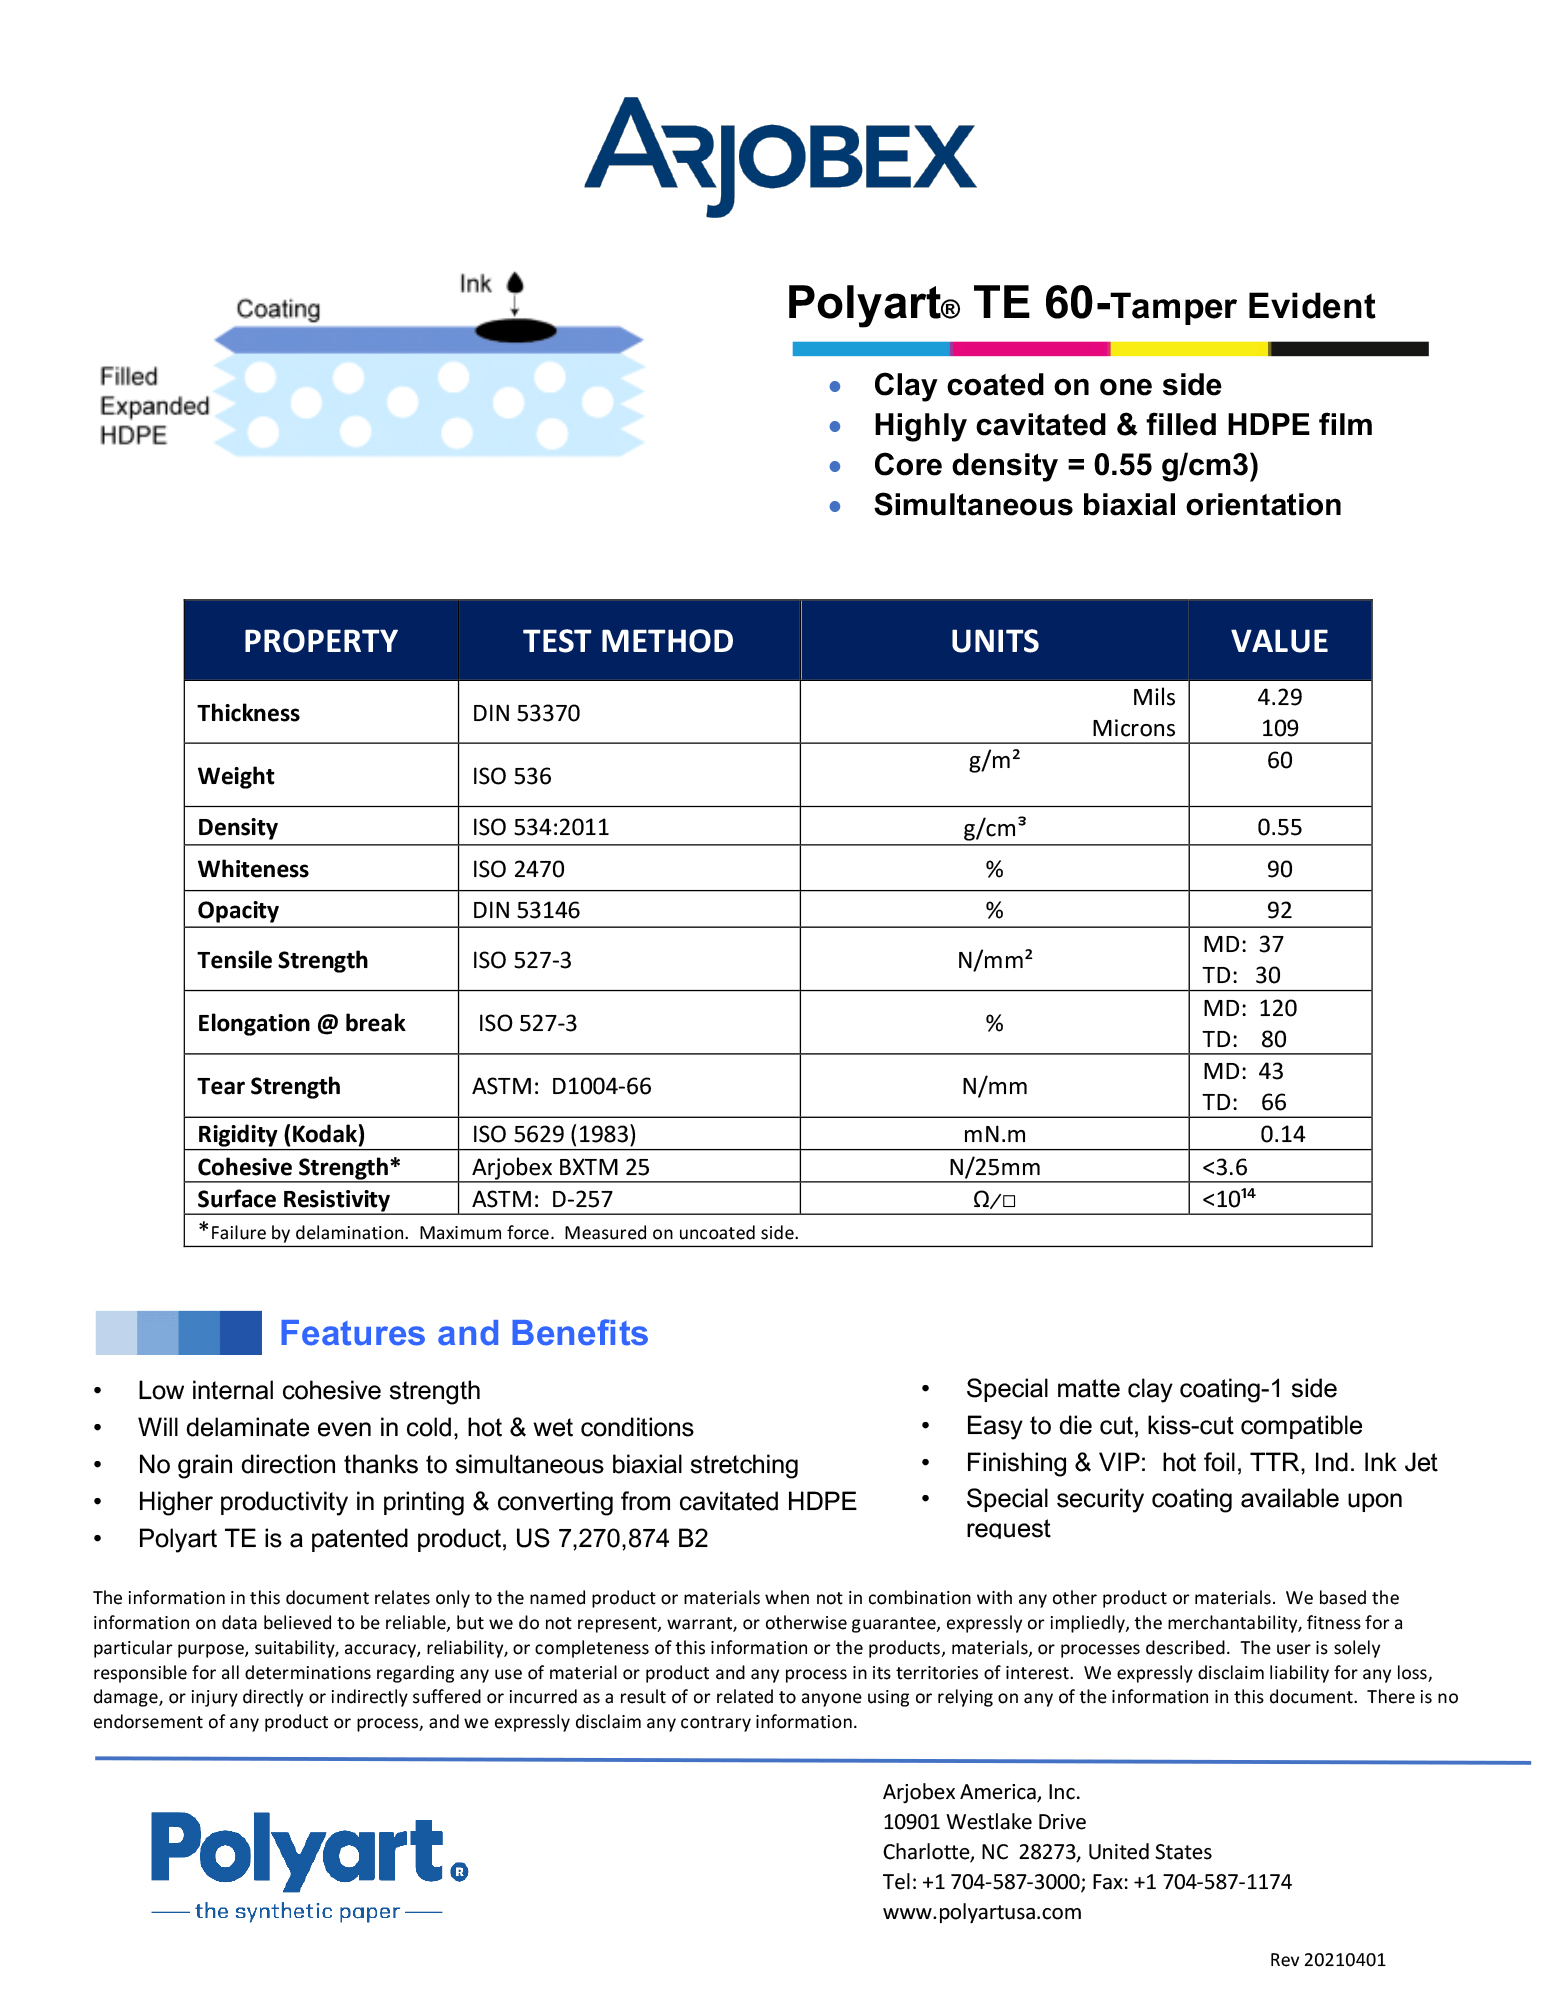 Arjobex Data Sheet_Polyart TE60